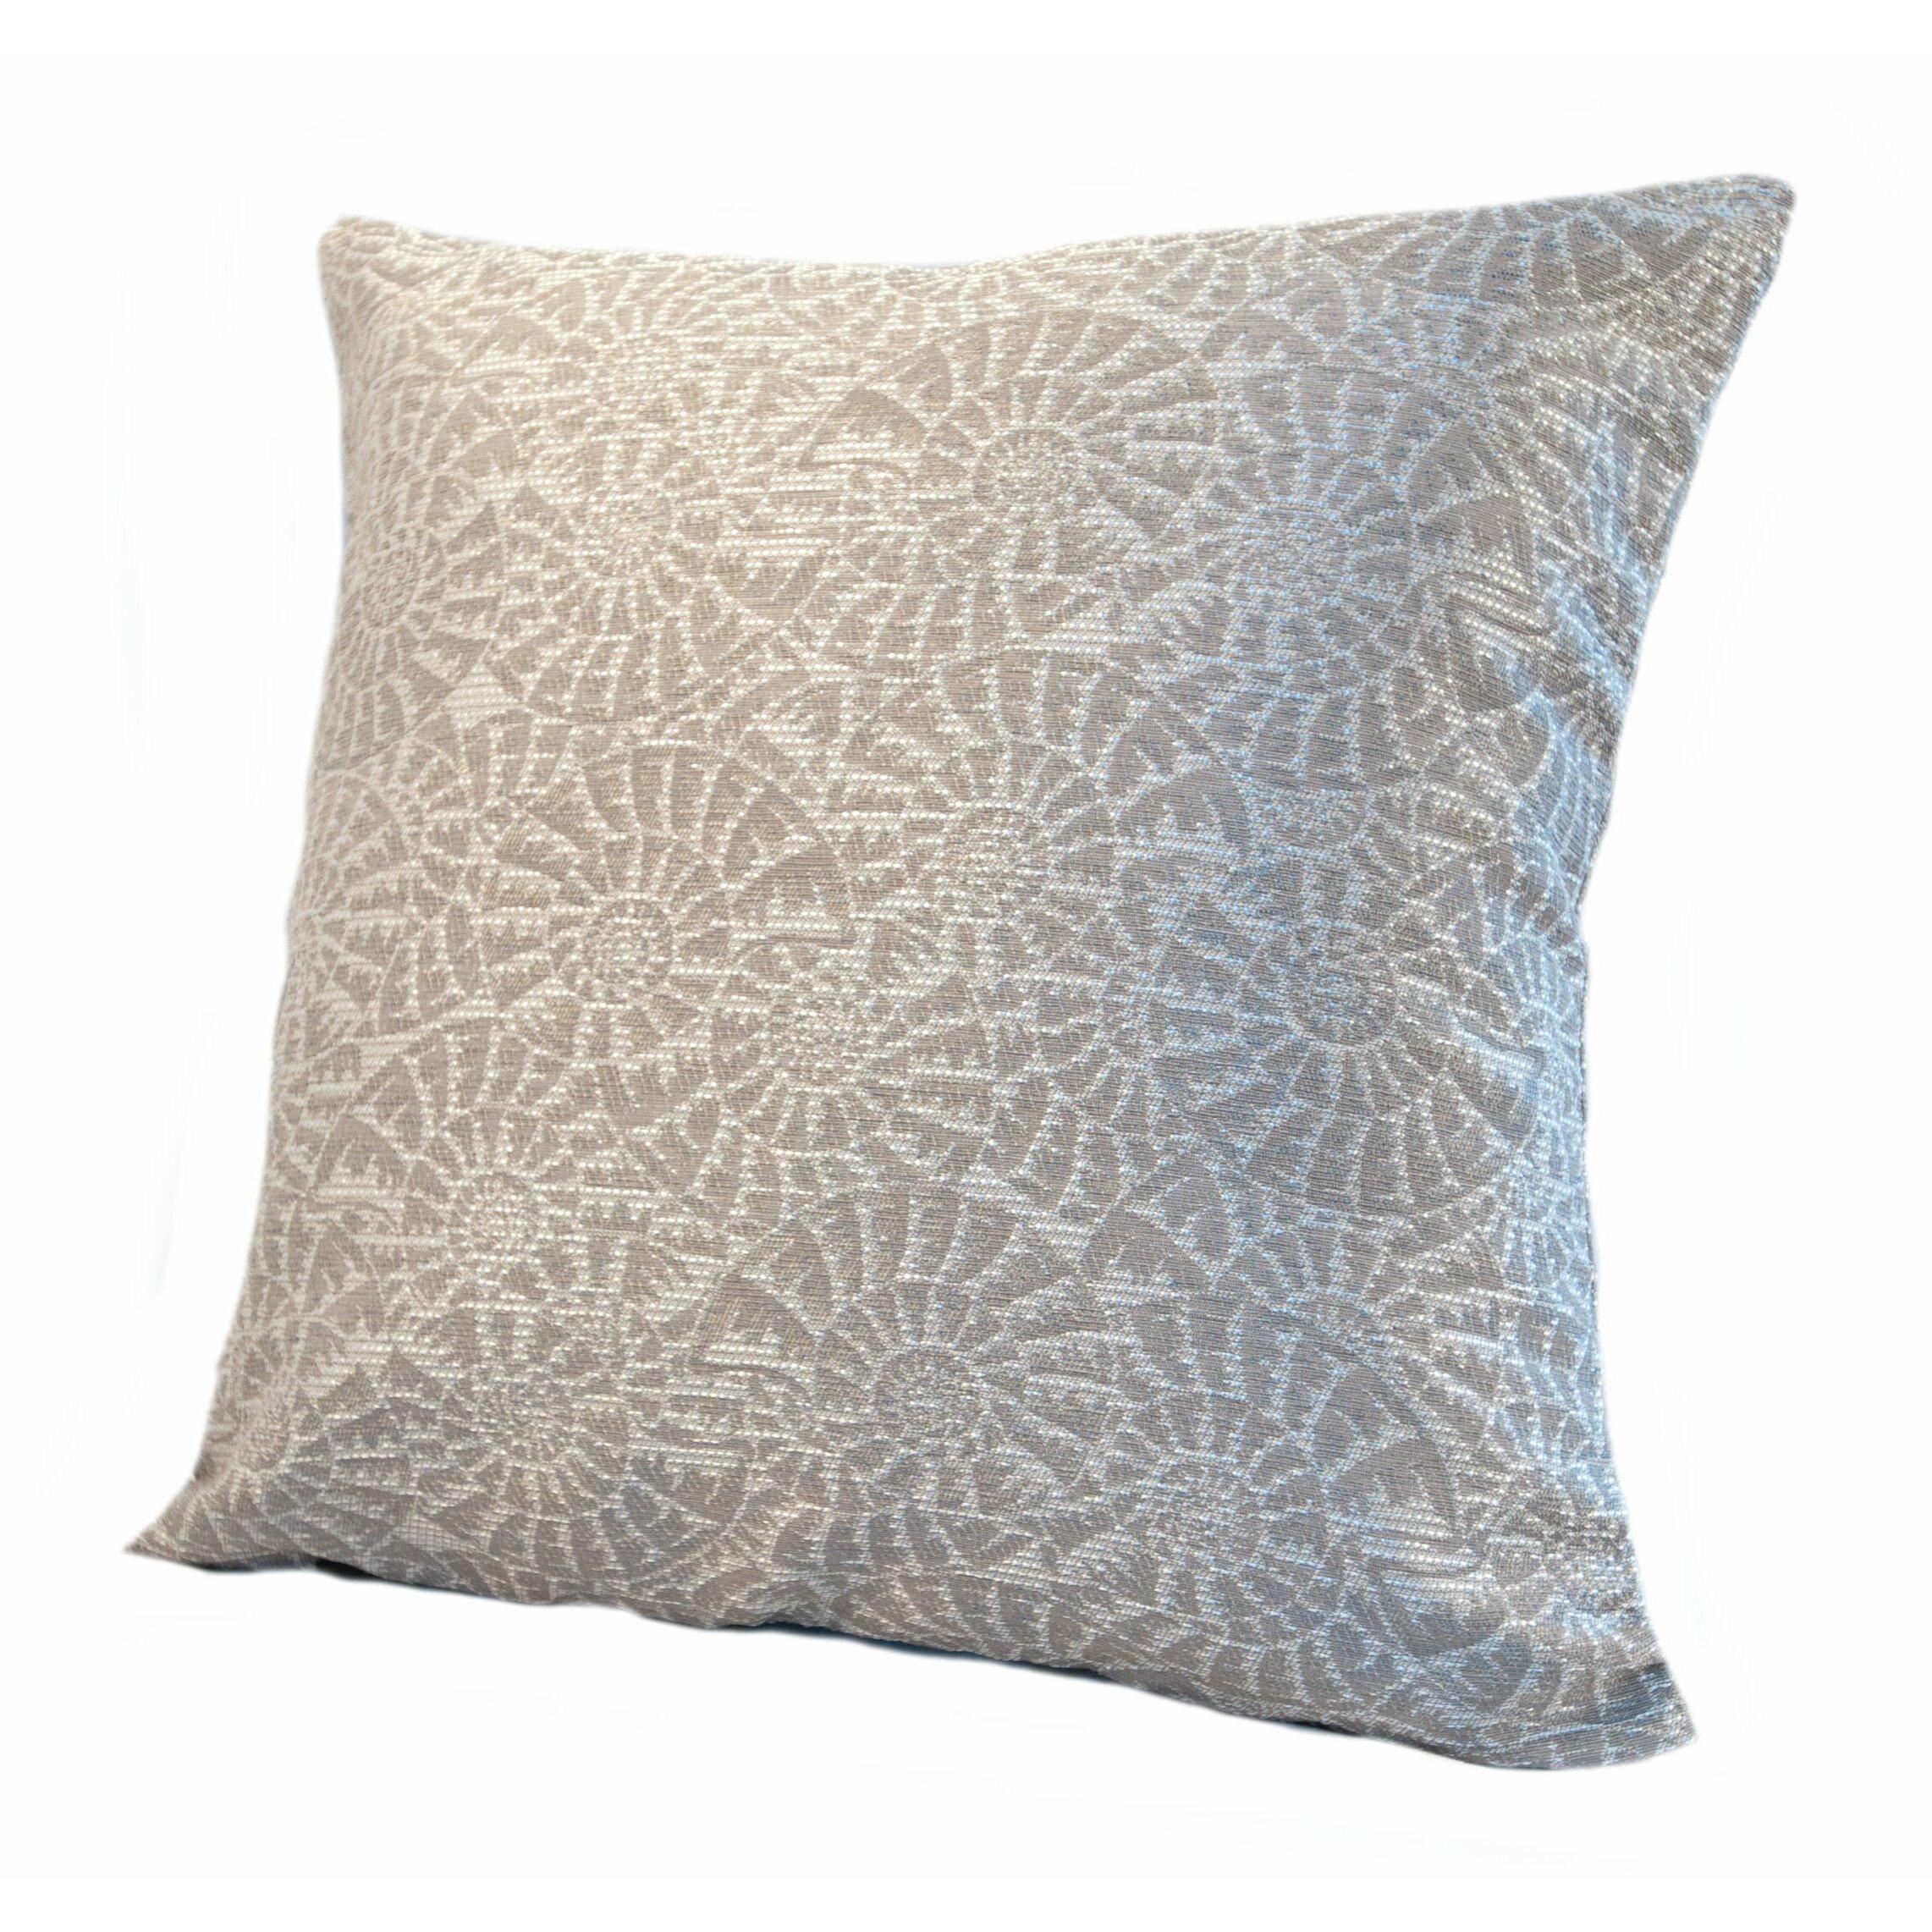 Coastal Color Throw Pillows : Rennie & Rose Design Group Coastal Tide Pool Throw Pillow & Reviews Wayfair